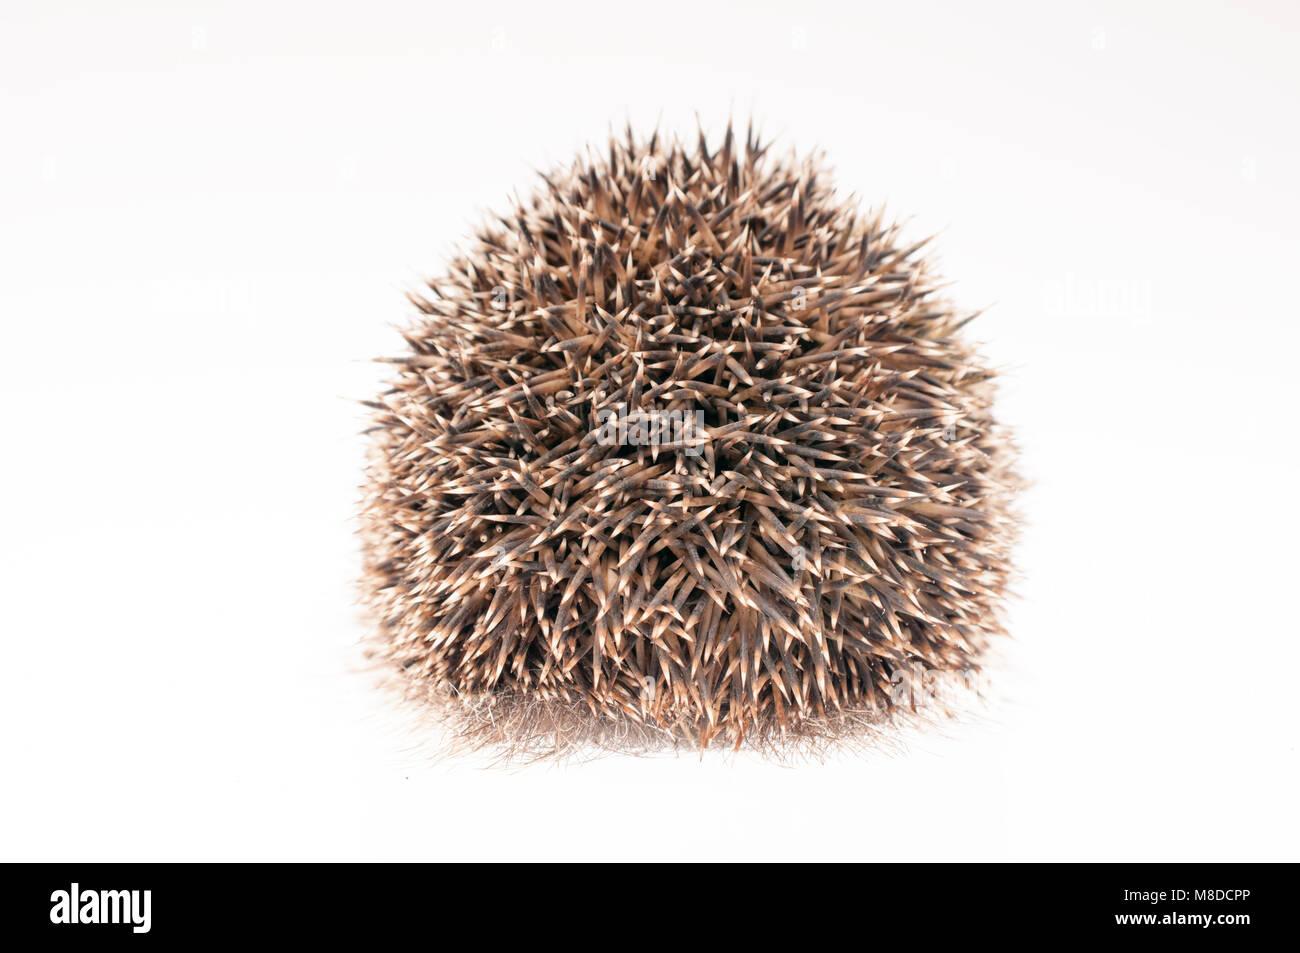 Back of a hedgehog on white background - Stock Image